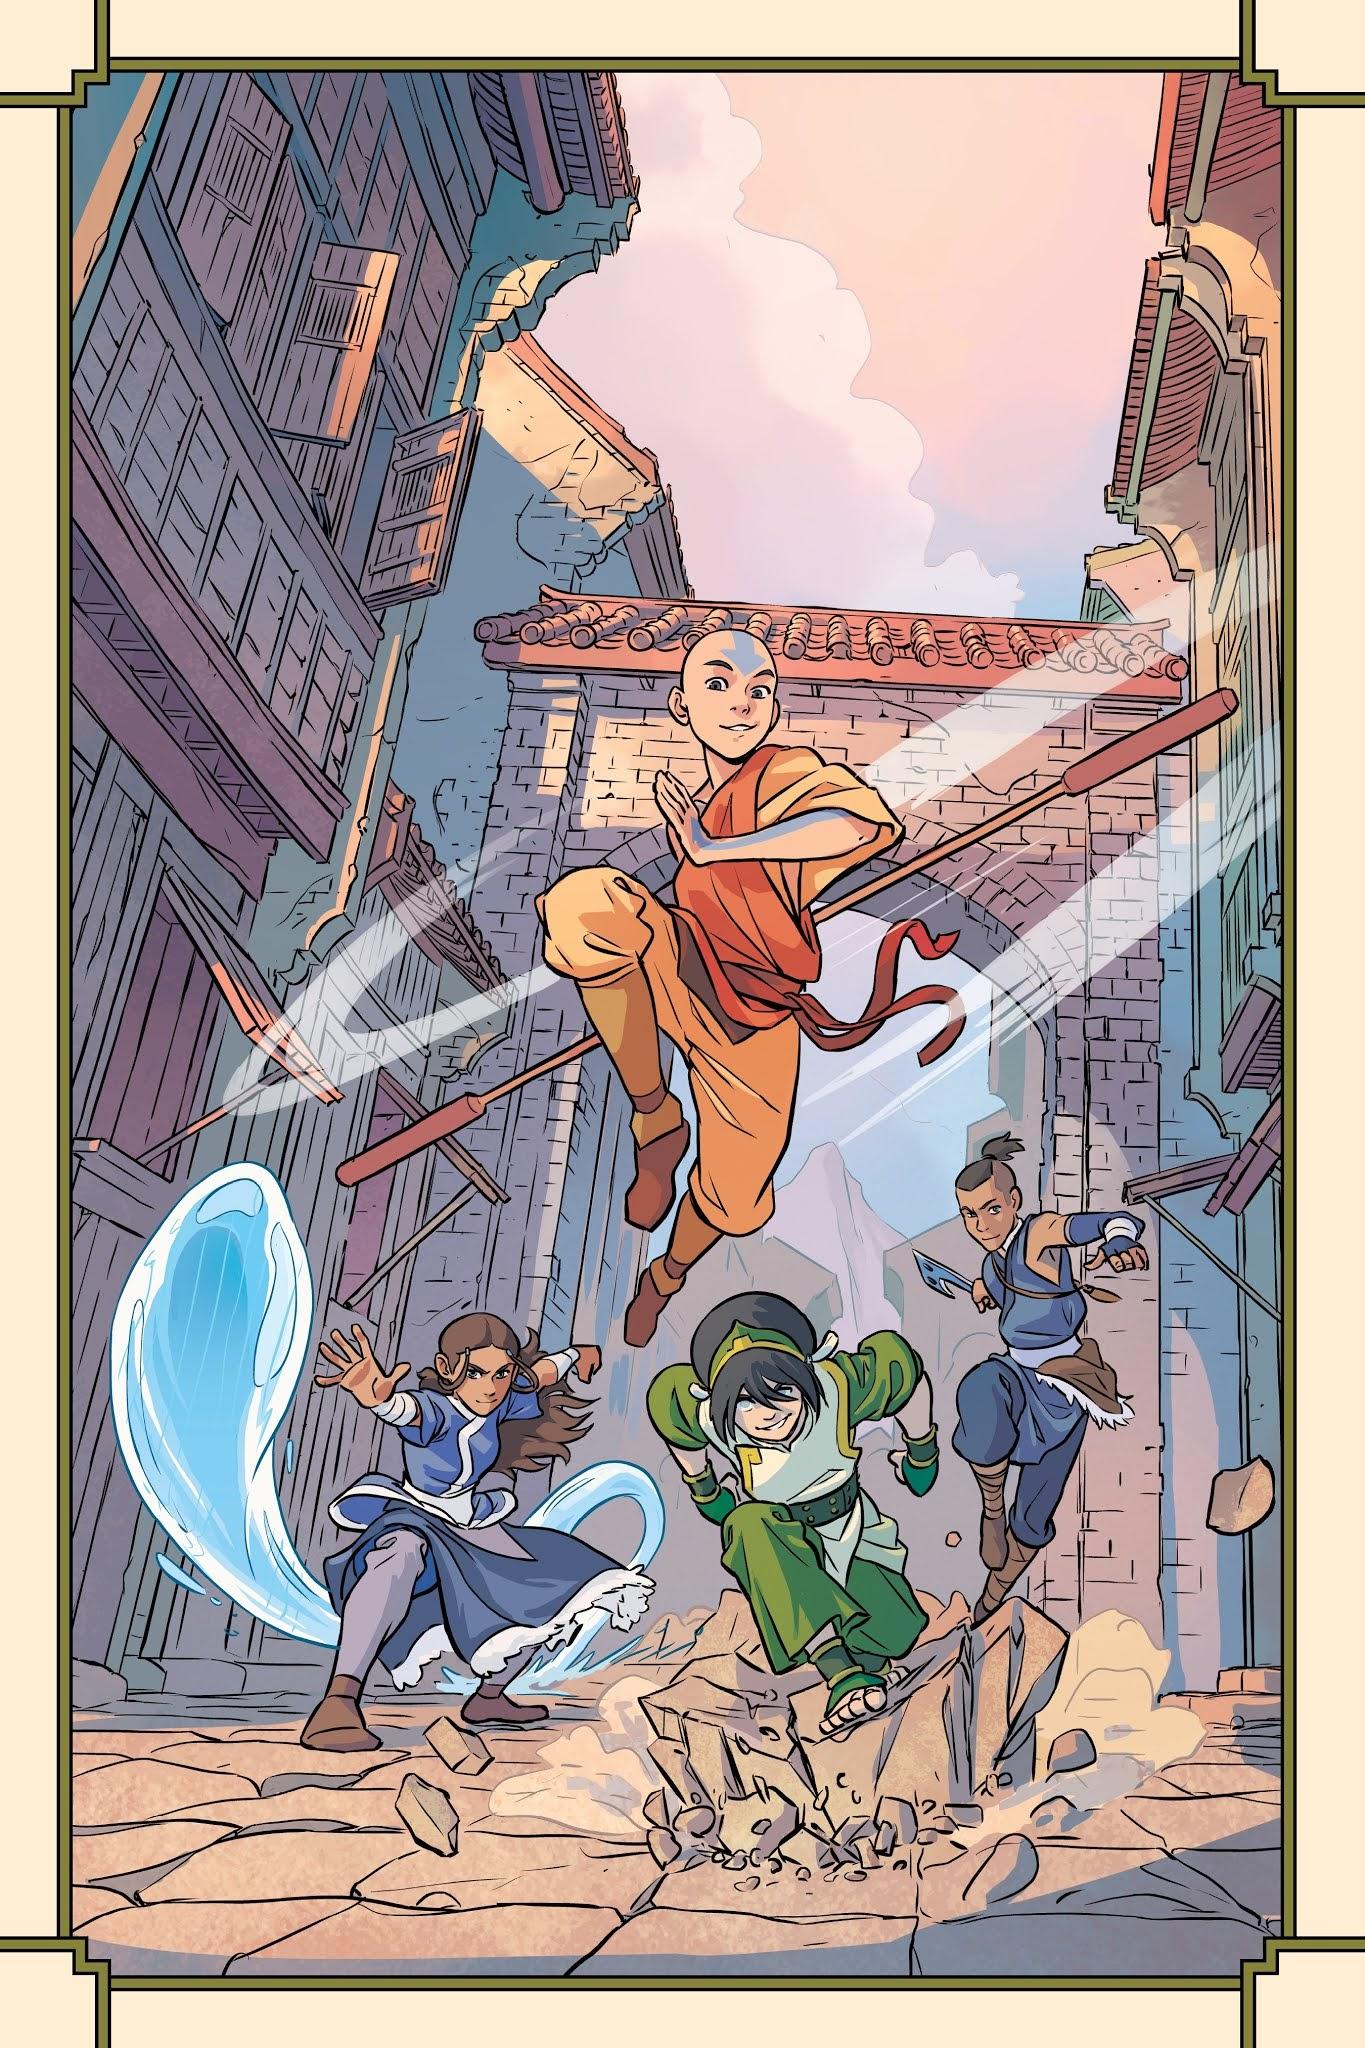 Nickelodeon Avatar The Last Airbender Imbalance Tpb 1